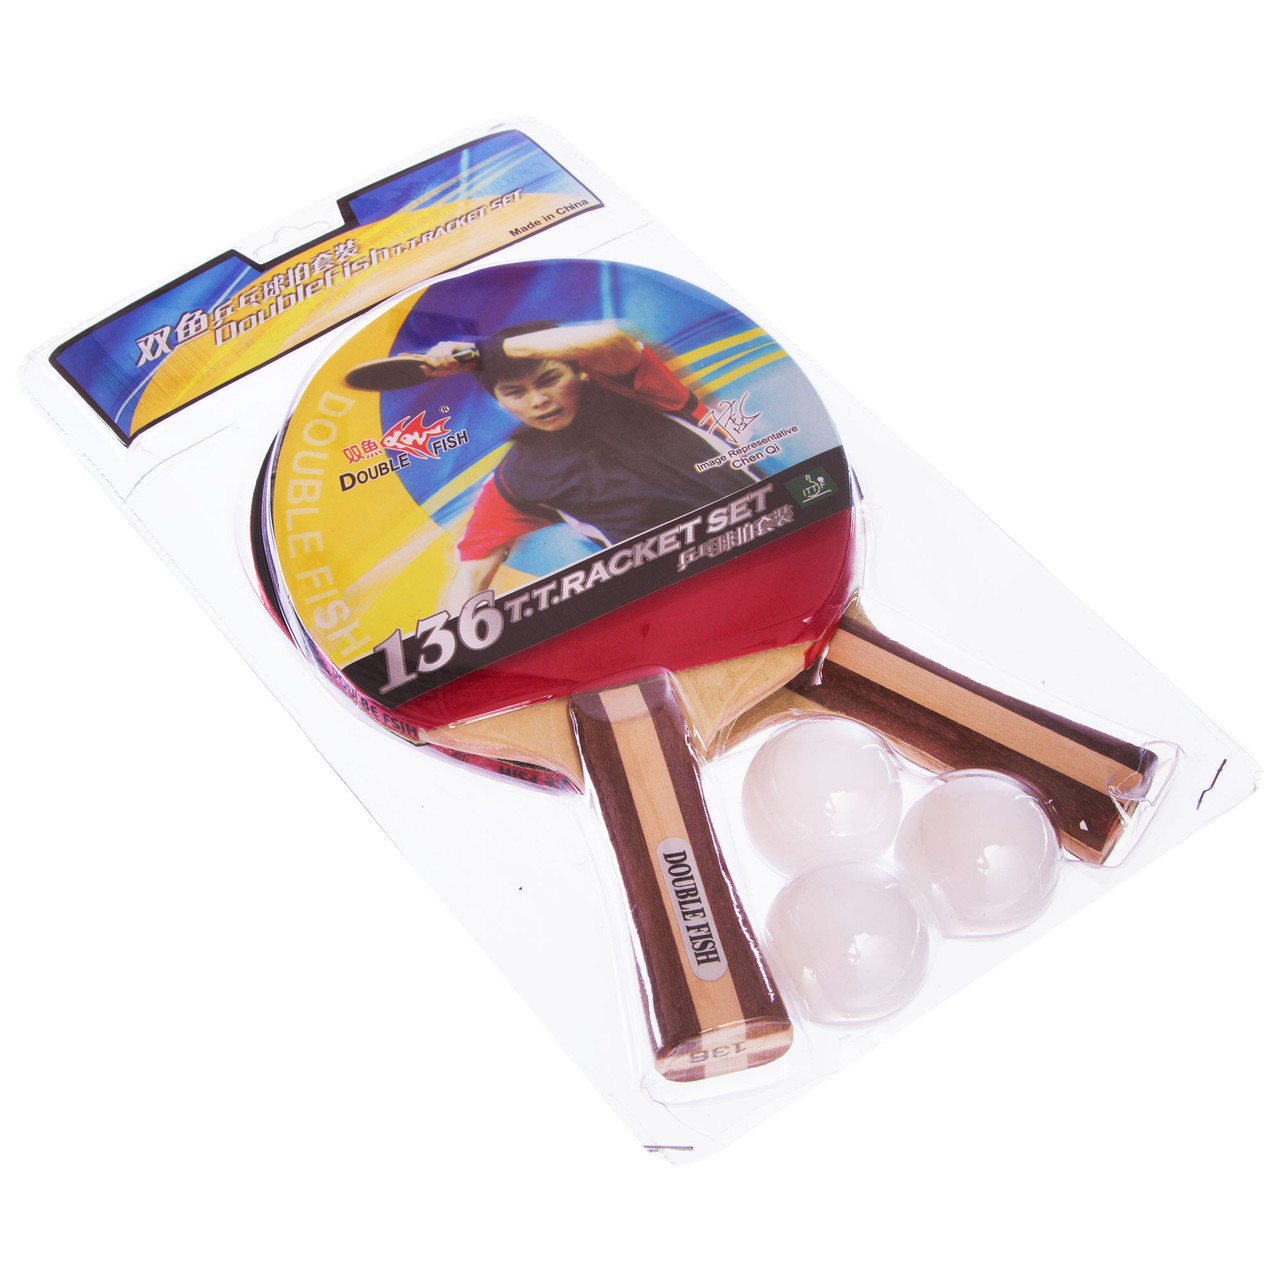 Набор для тенниса настольного 2 ракетки, 3 мяча DOUBLE FISH MT-136